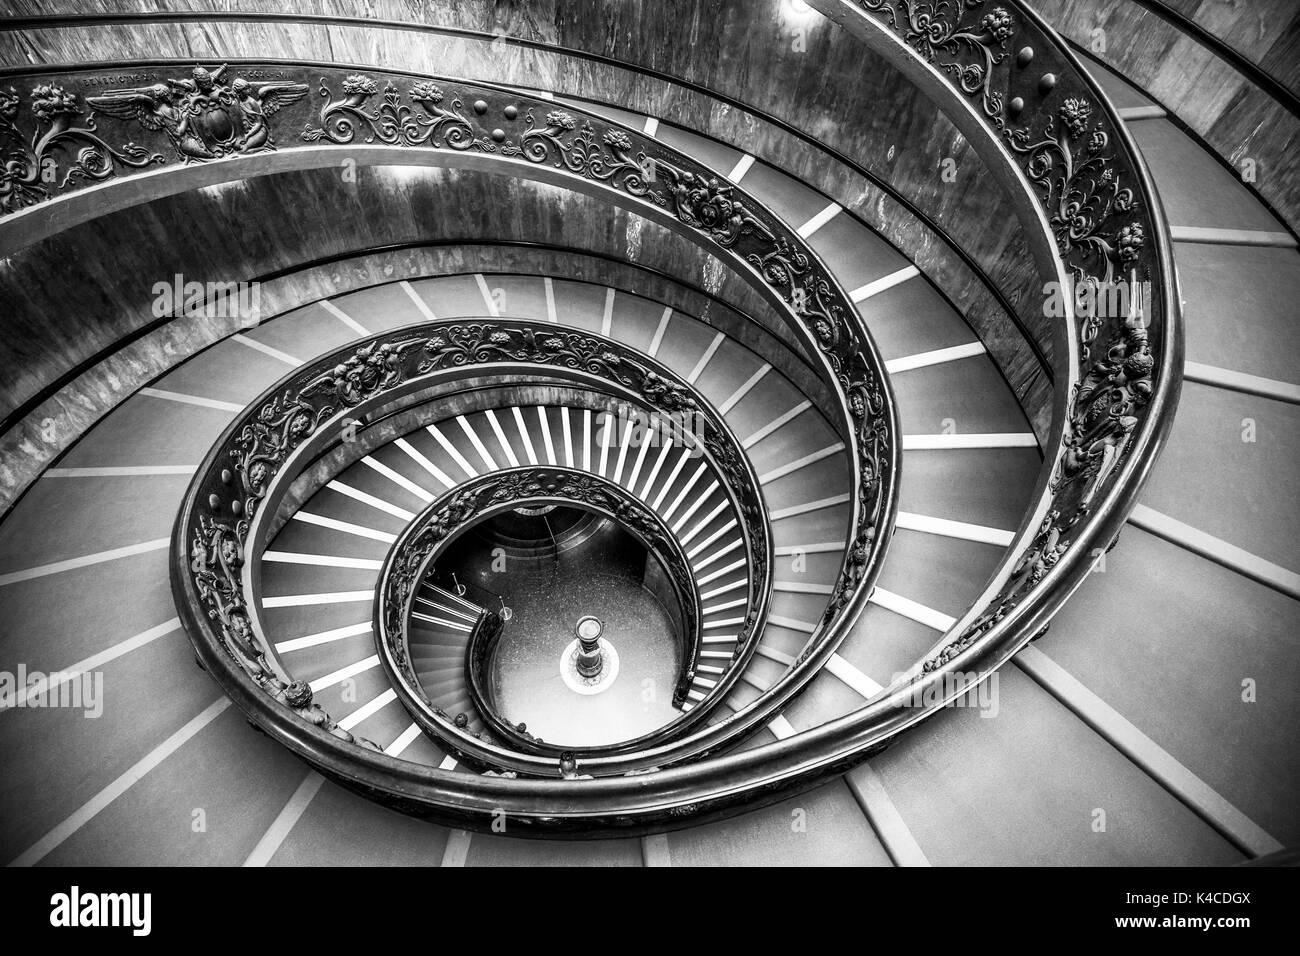 Rome: The Eternal CityRoman Ruins, the Vatican